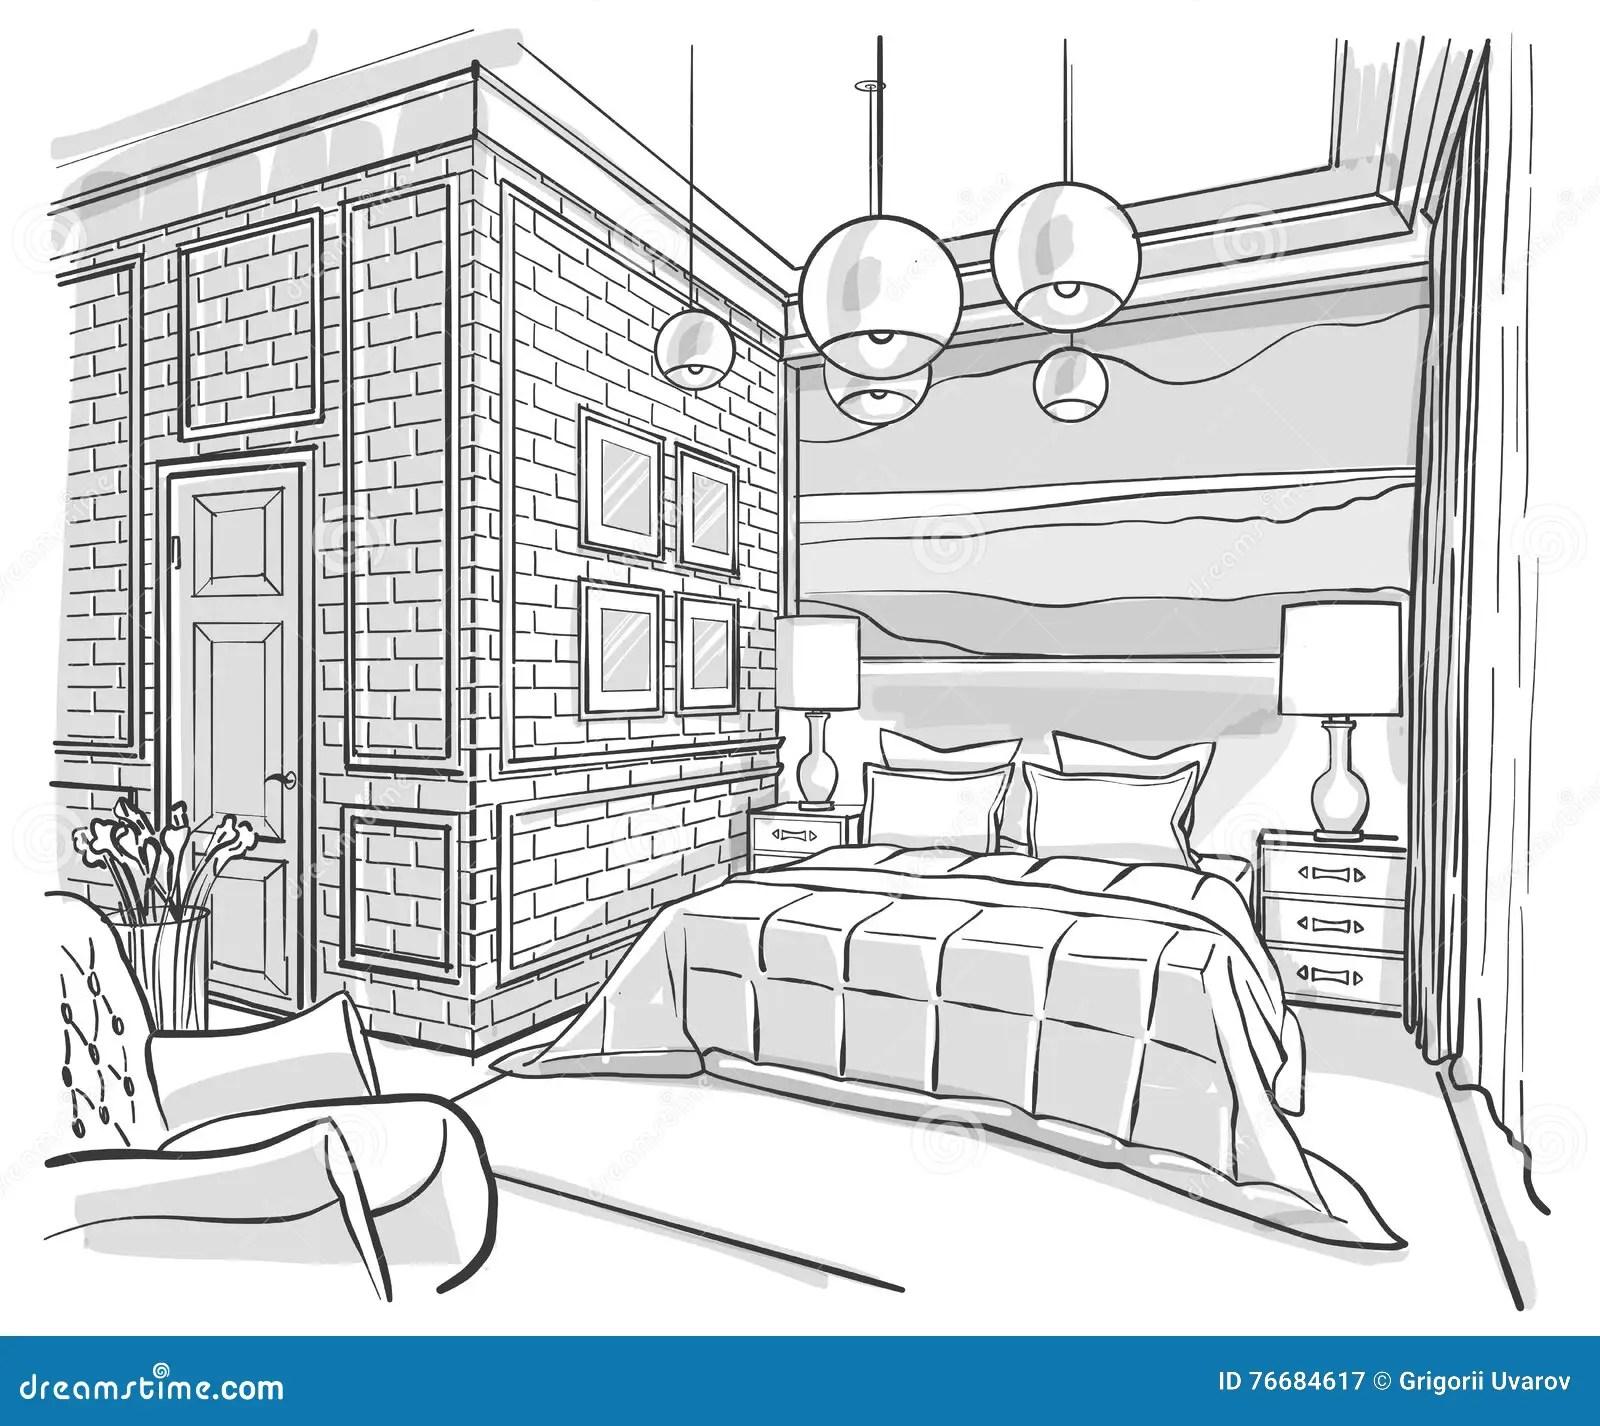 Bedroom Interior Outline Vector Sketch Drawing Stock